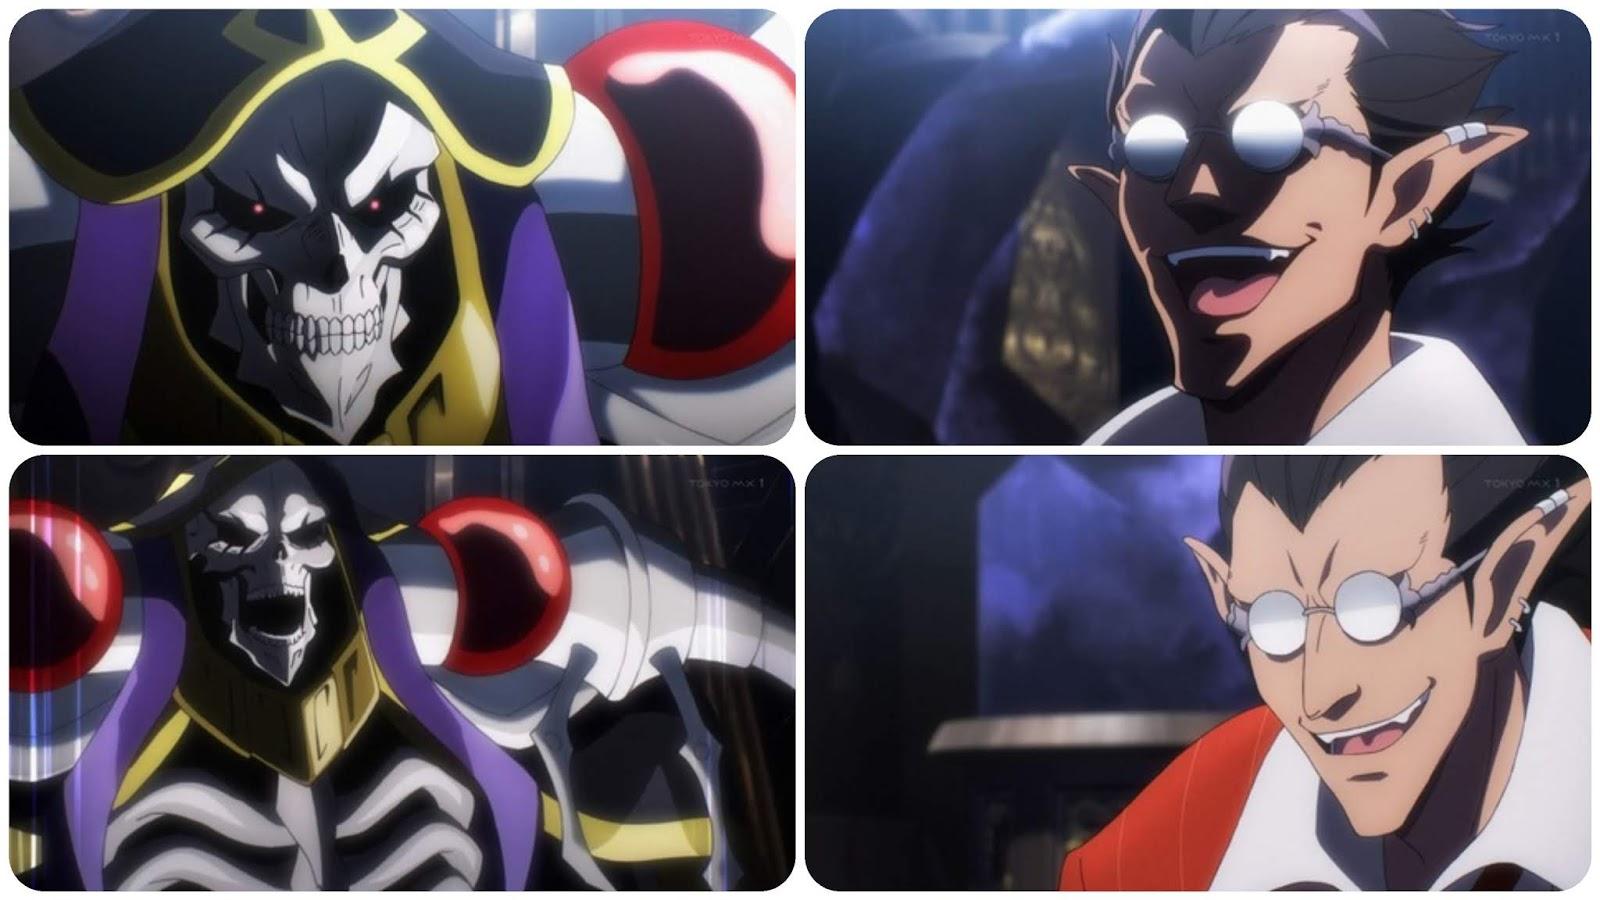 Anime Nikki: [Overlord III] Episode 2 everyone's impressions